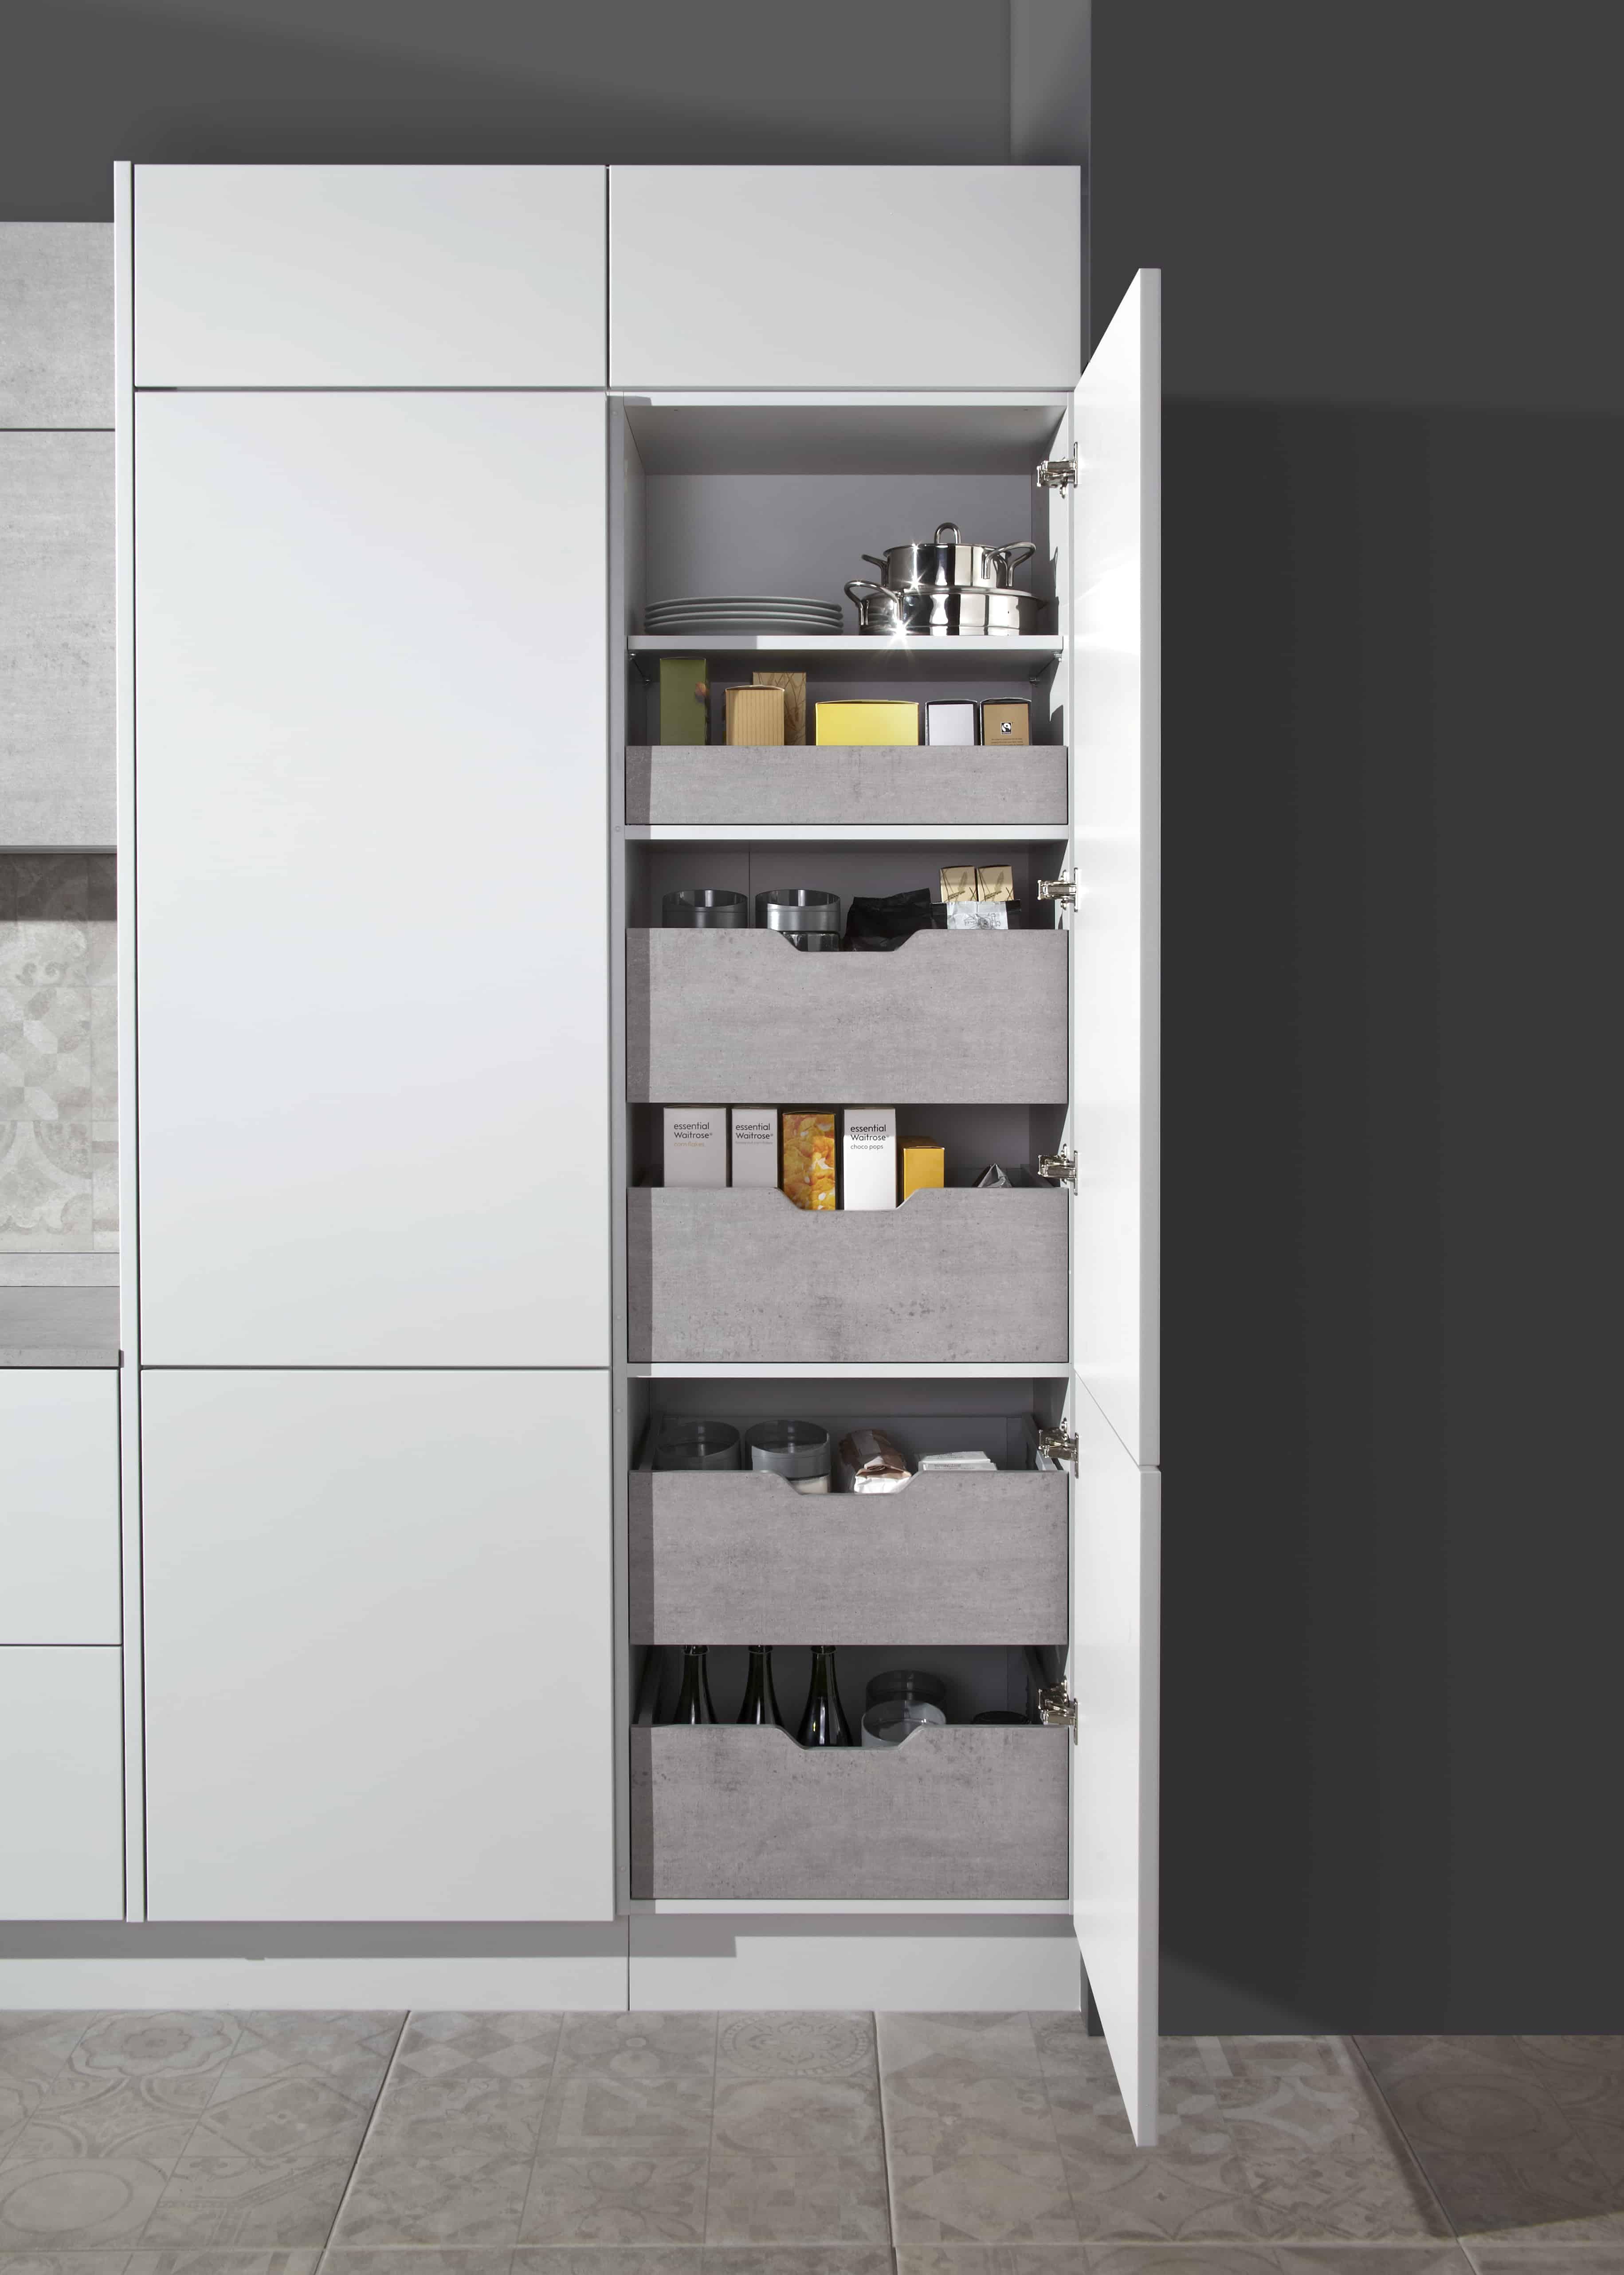 blum space tower noble kitchens. Black Bedroom Furniture Sets. Home Design Ideas